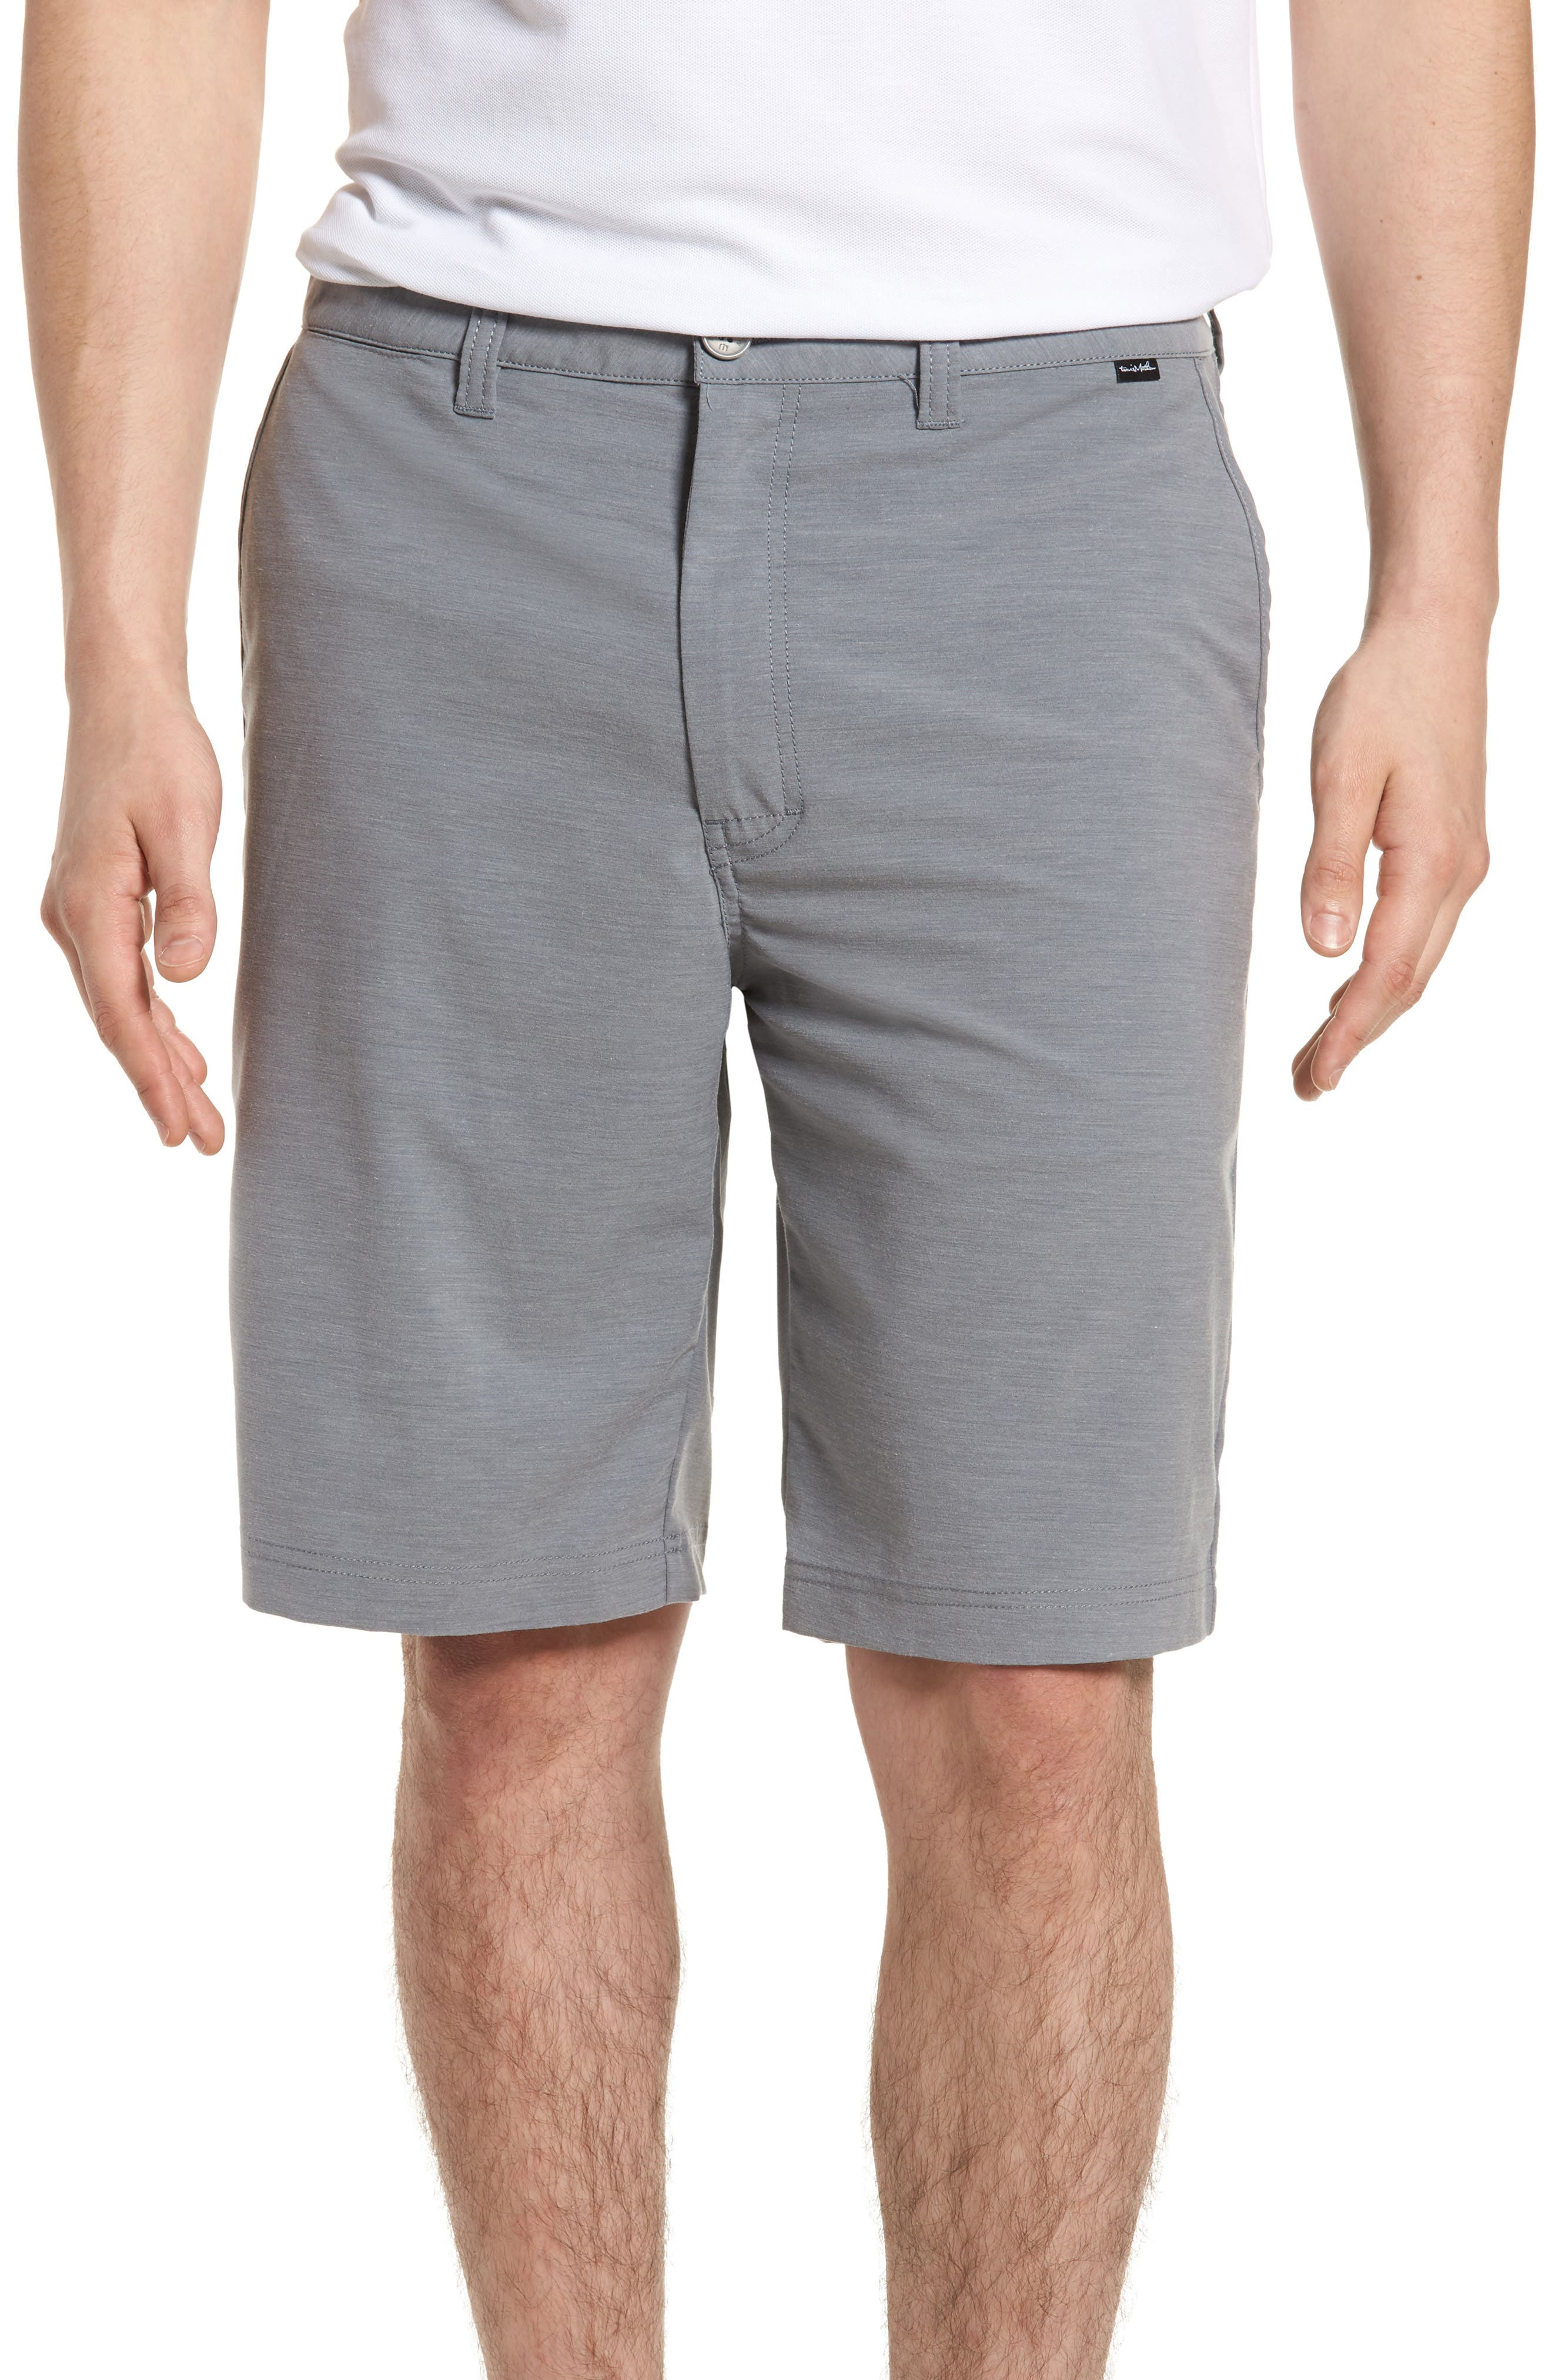 La Paz Regular Fit Slub Knit Shorts,                         Main,                         color, 020